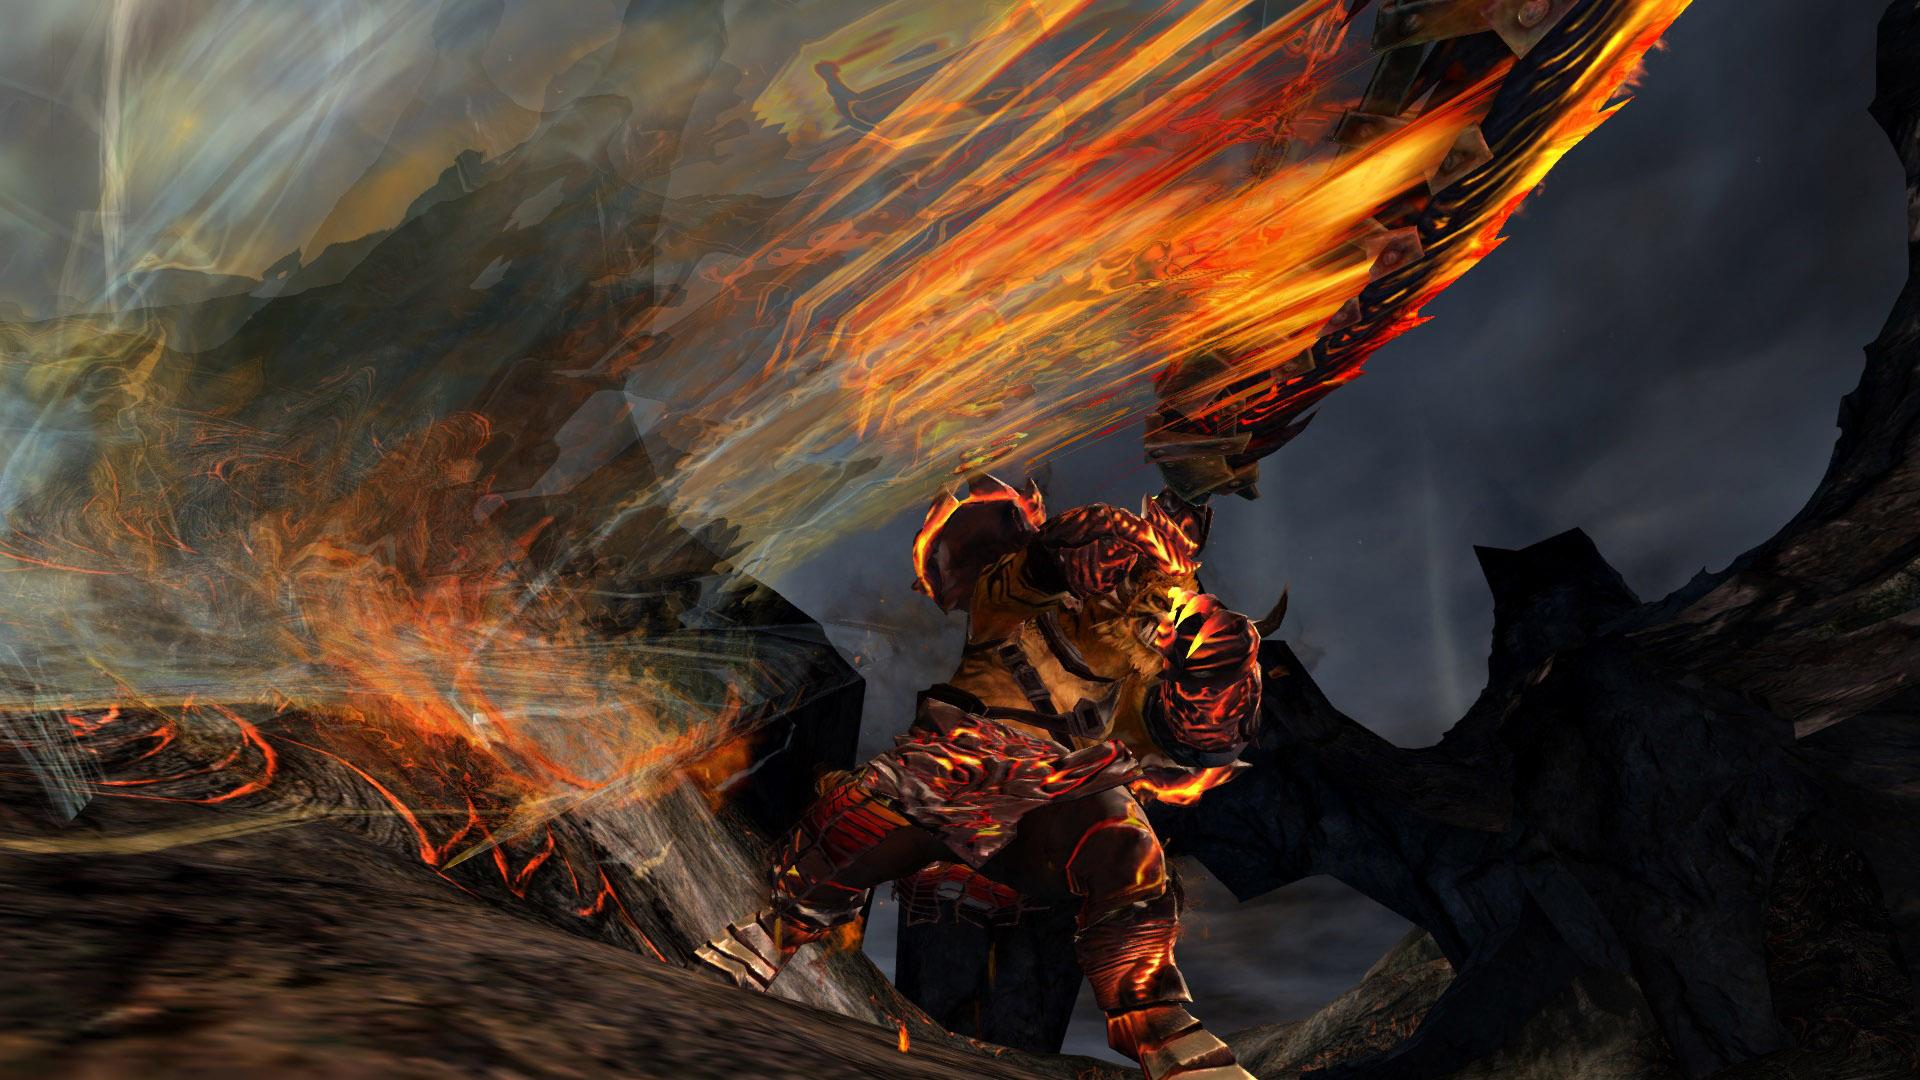 morefire